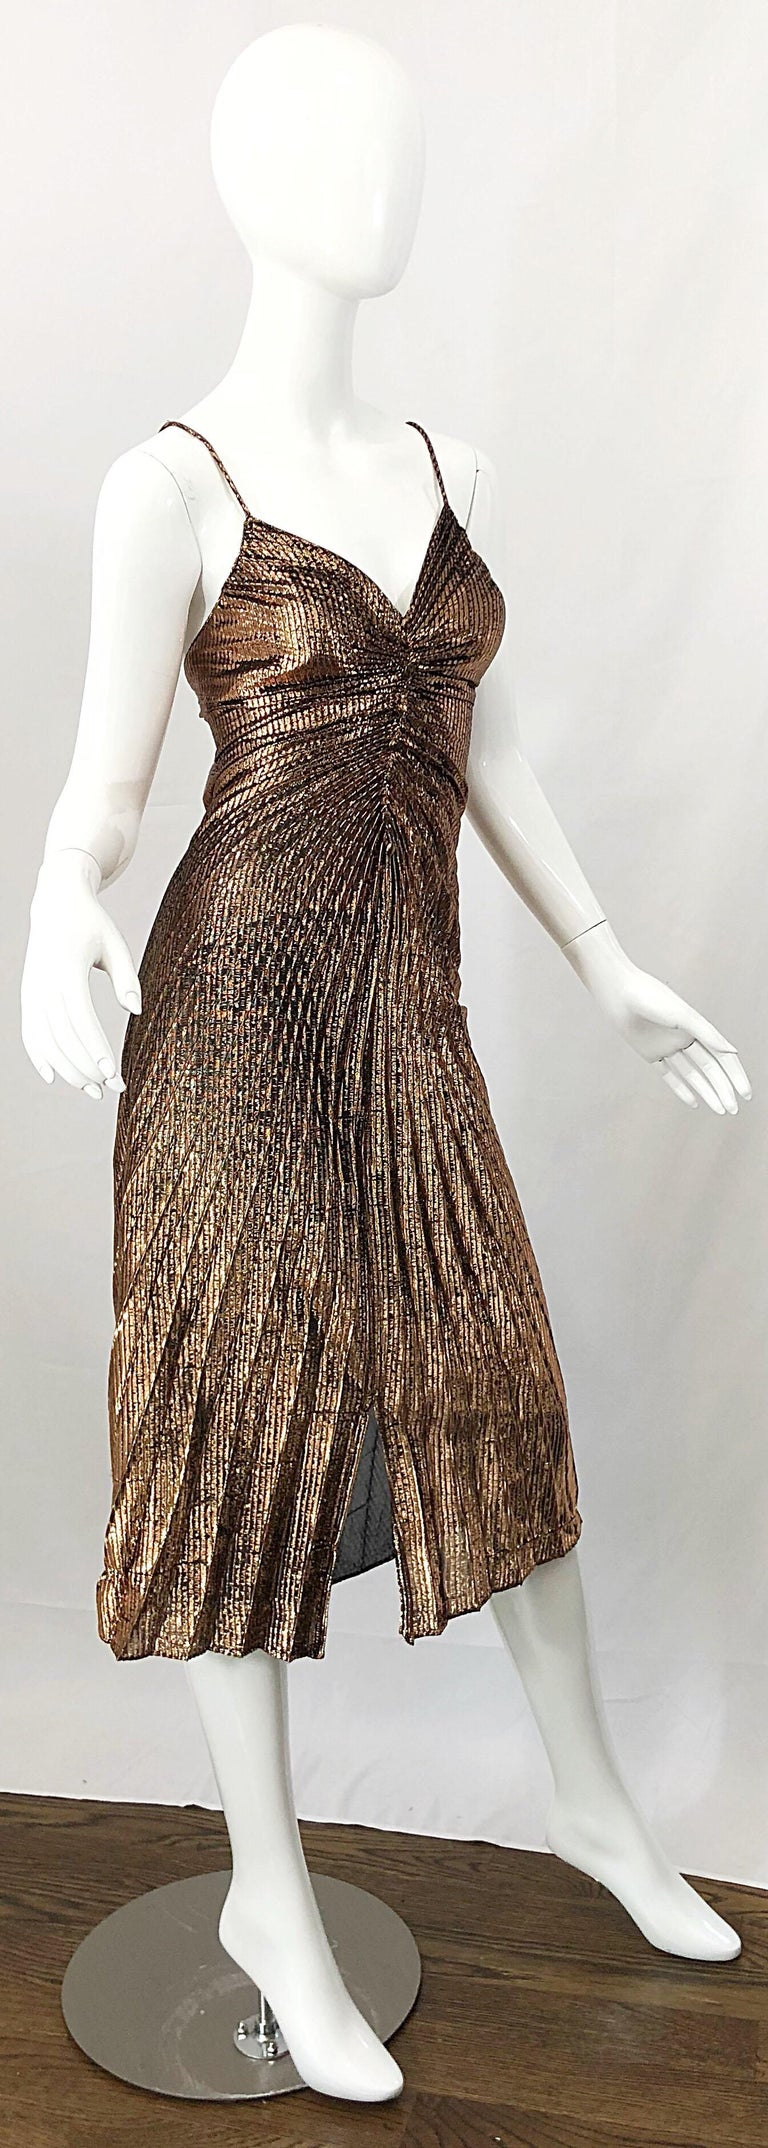 1970s Samir Sexy Golden Bronze Pleated Disco Studio 54 Slinky Vintage 70s Dress For Sale 1